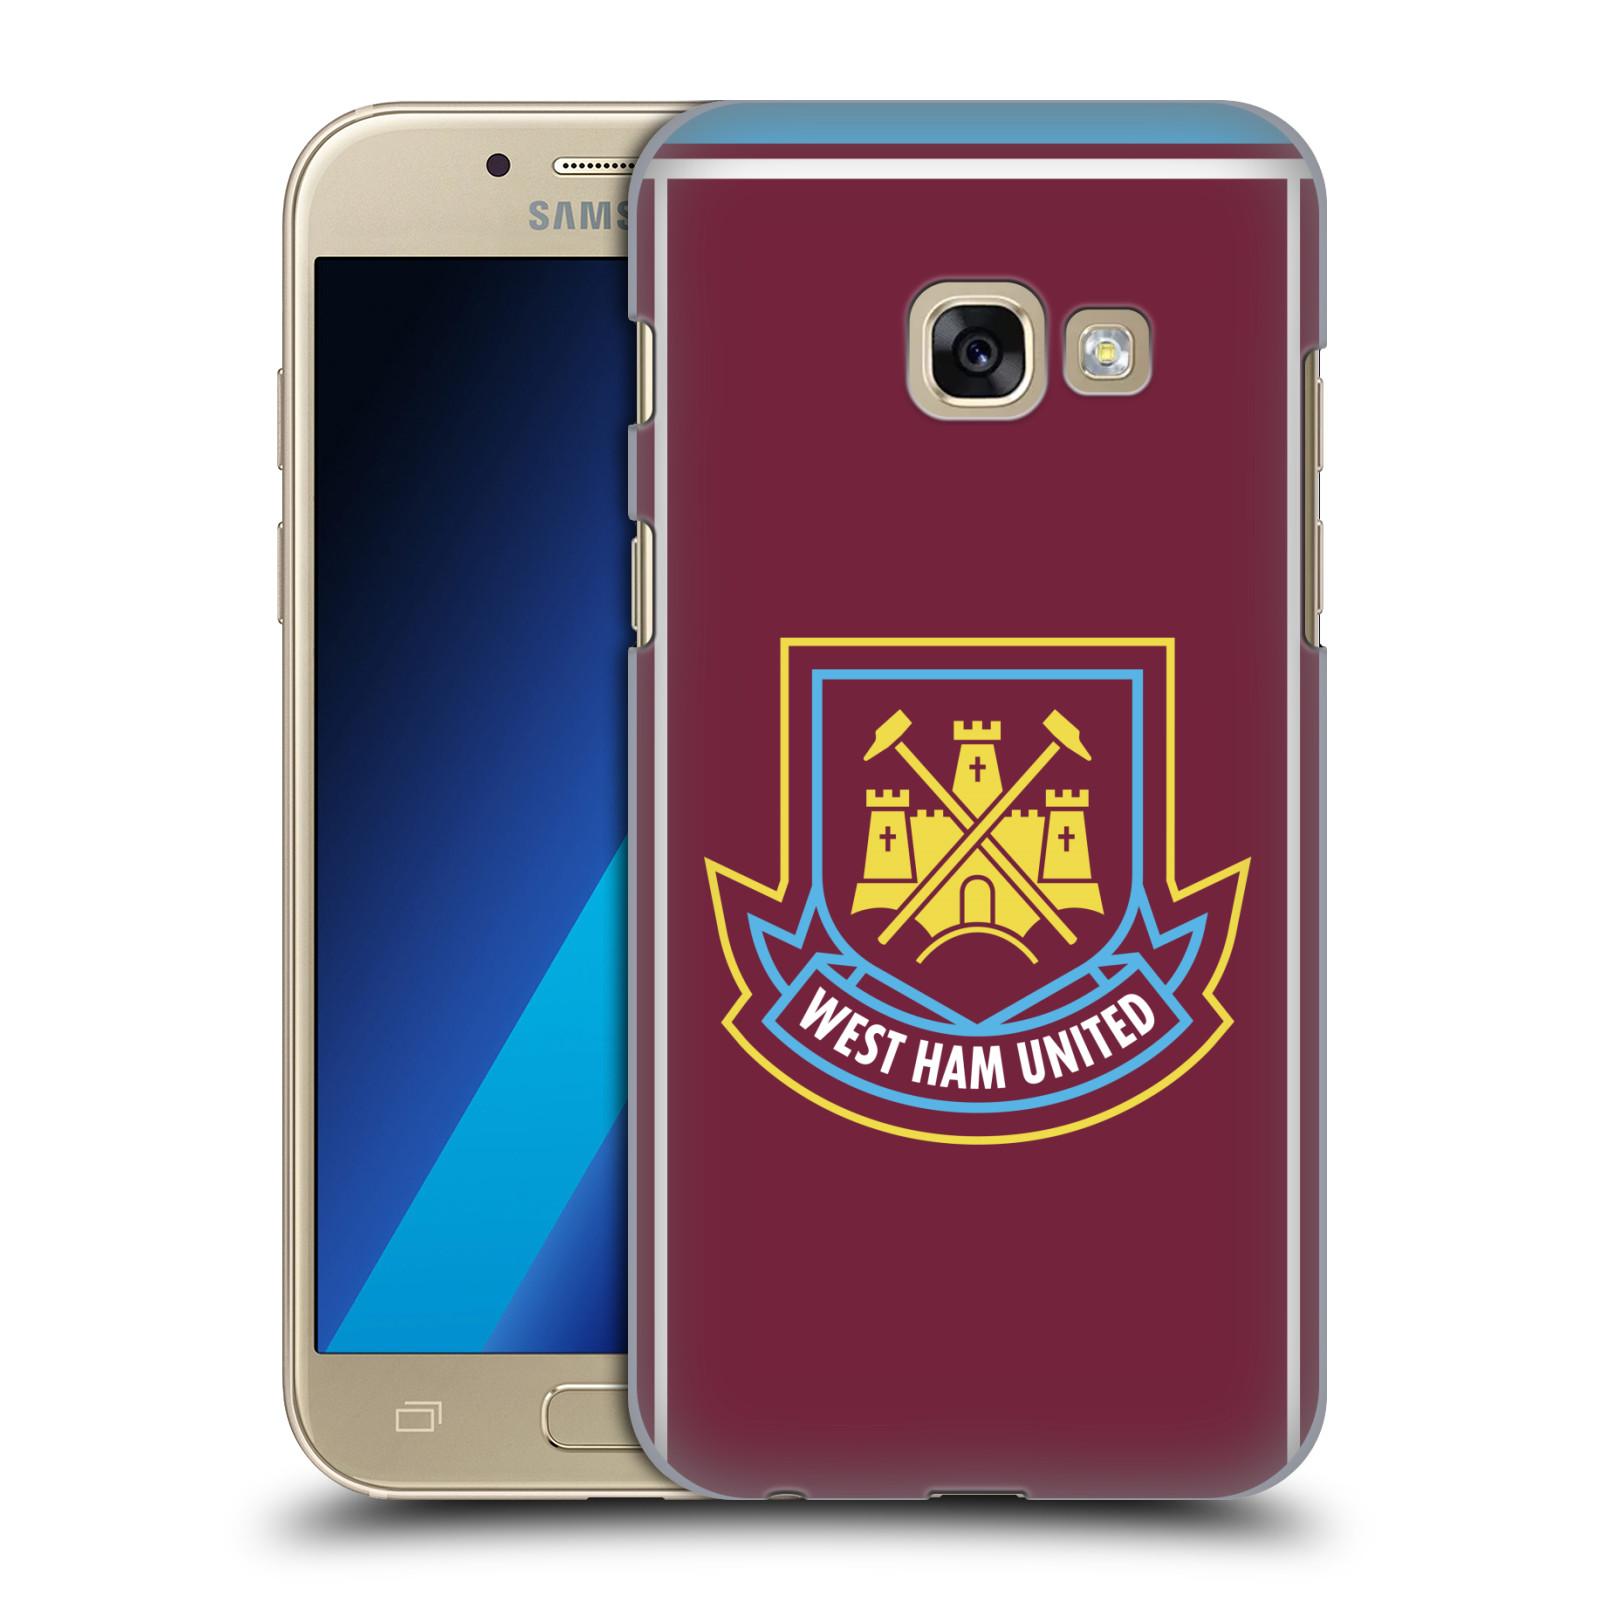 Plastové pouzdro na mobil Samsung Galaxy A3 (2017) - Head Case - West Ham United - Retro znak